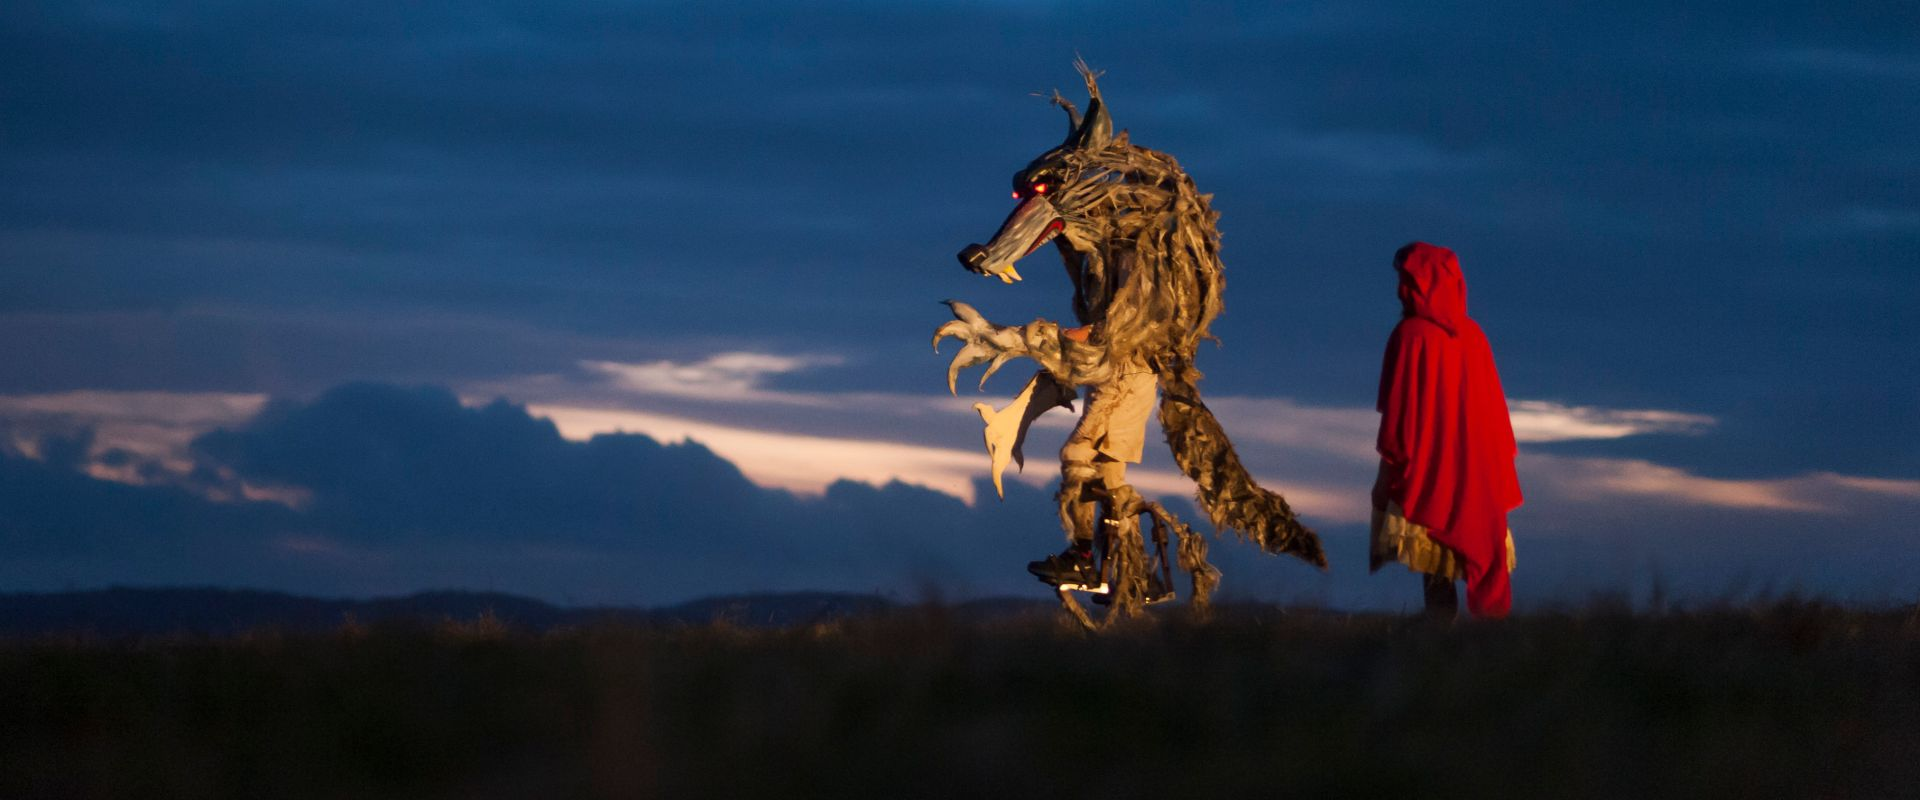 Moye_Burn-The-Curtain_Wolves_Sat_094